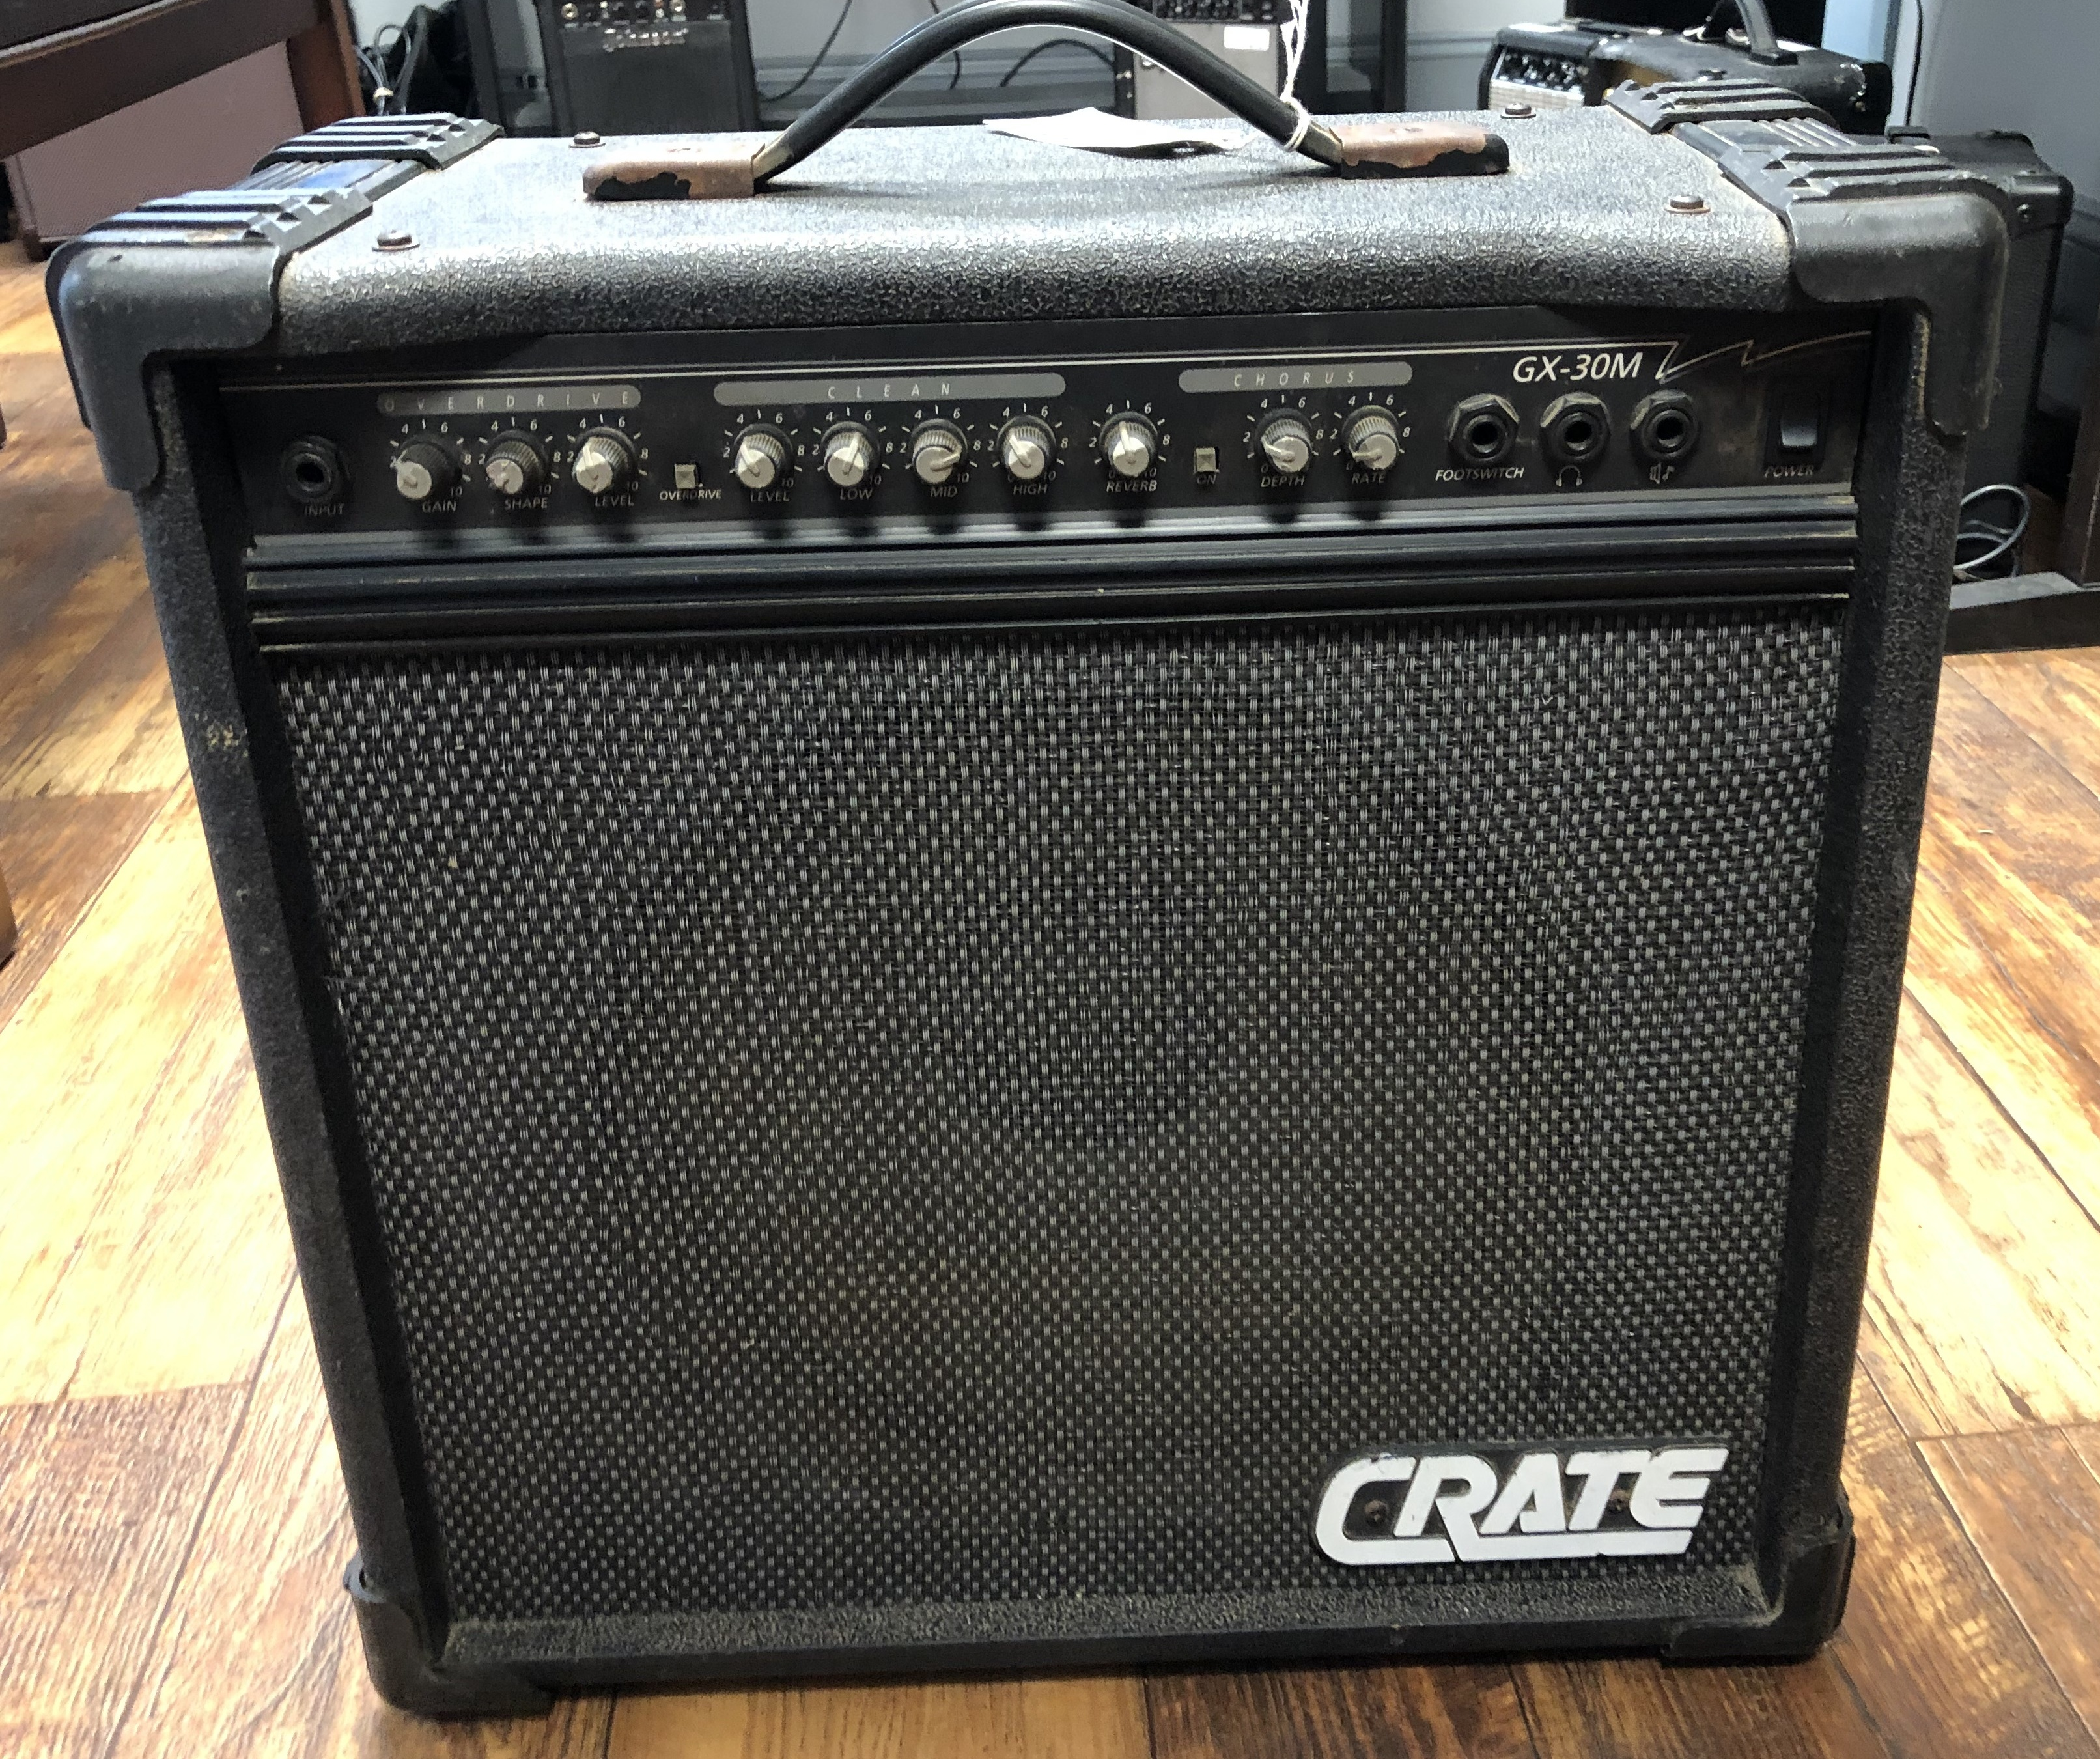 CRATE GX-30M AMP W/ CORD